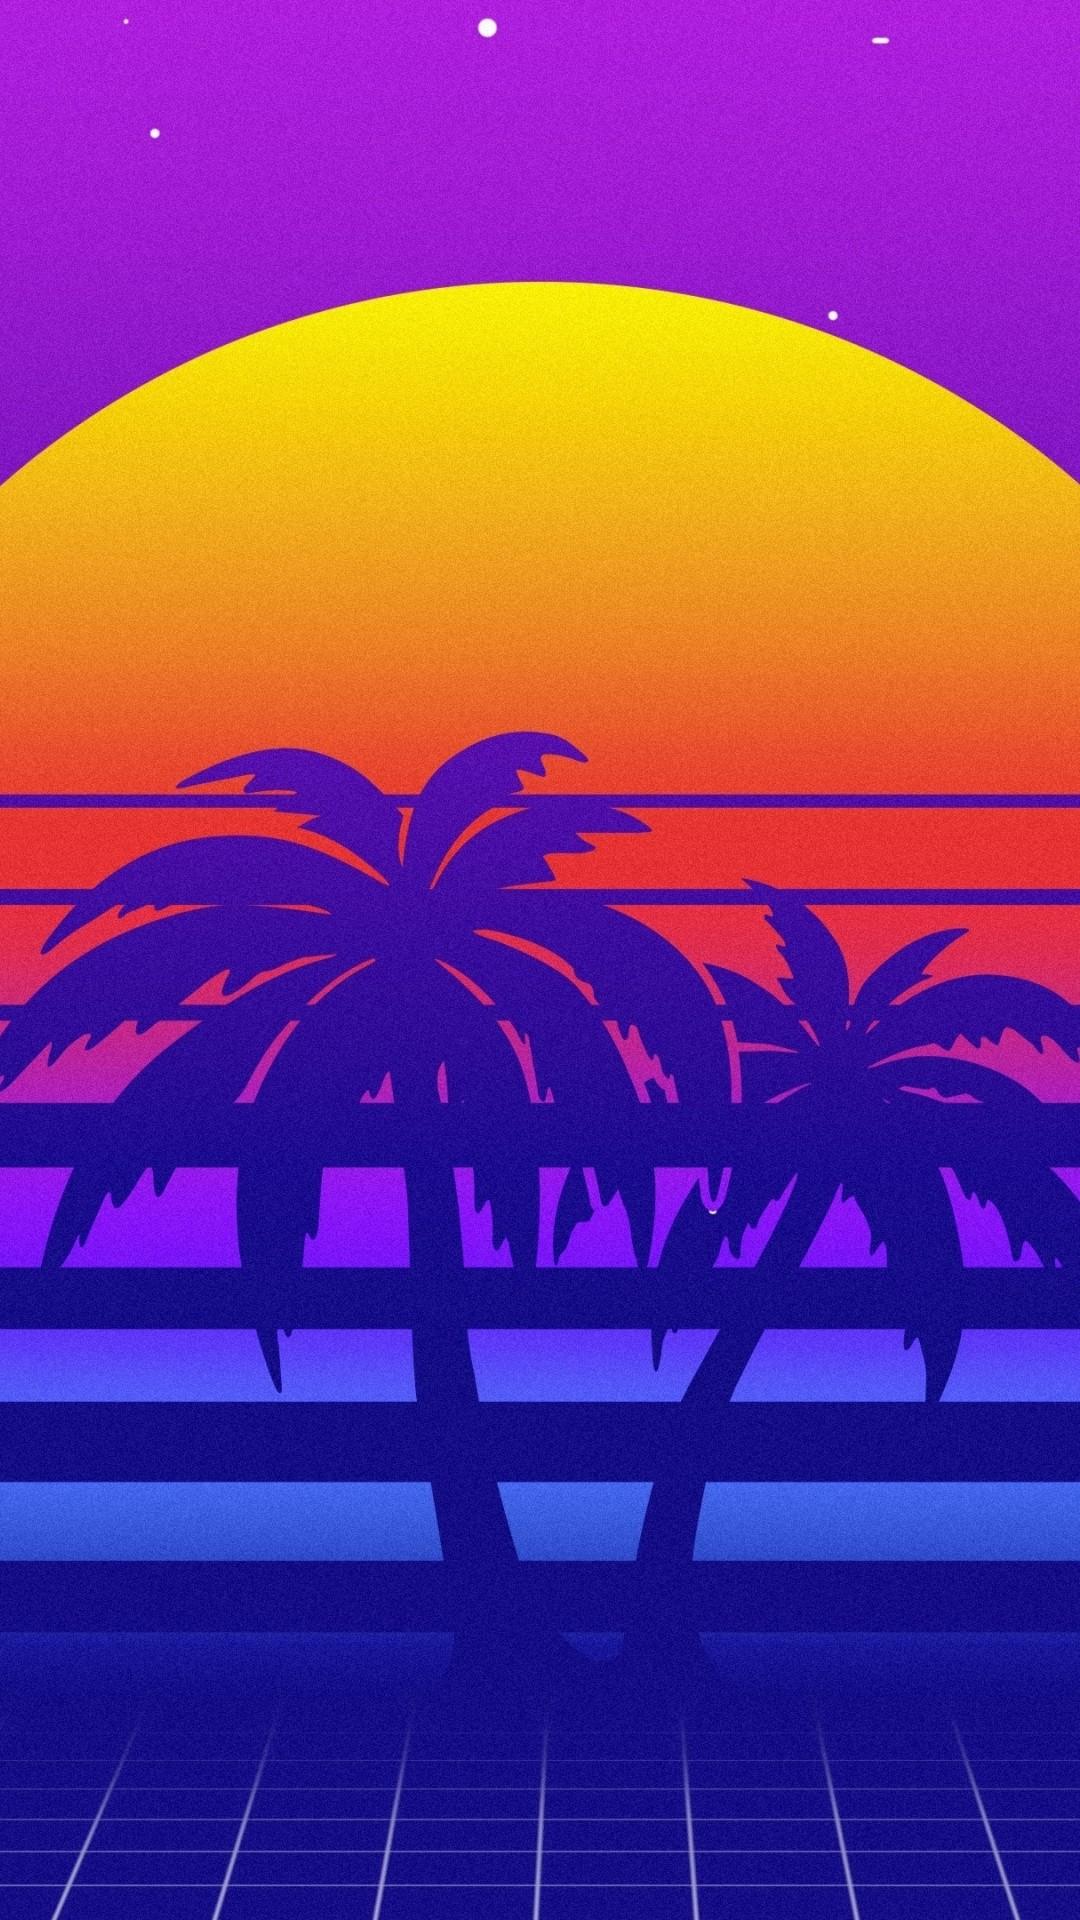 Retro iPhone 6 wallpaper